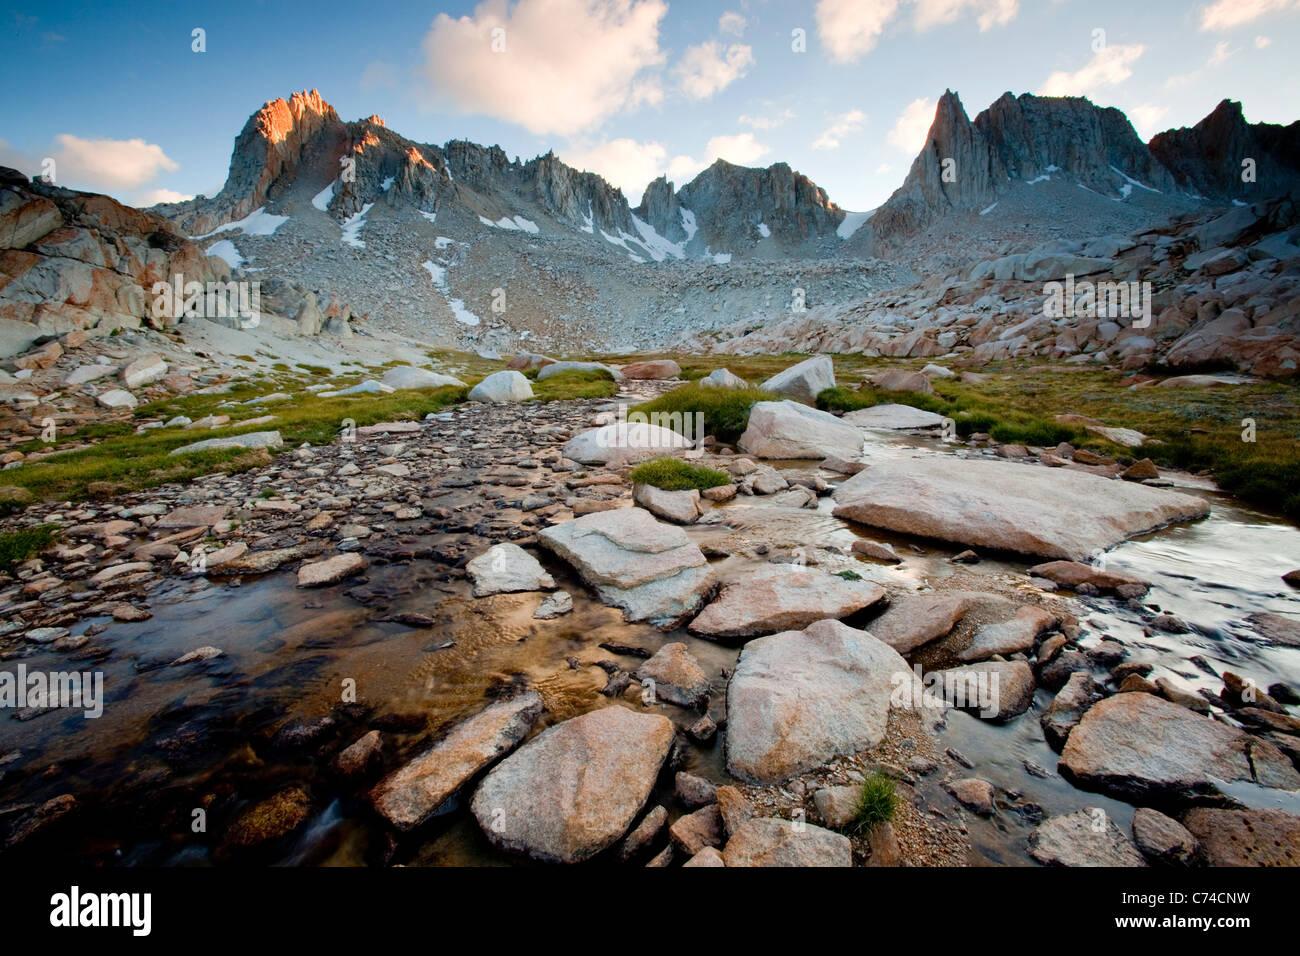 Sierra Nevada mountain range in California - Stock Image